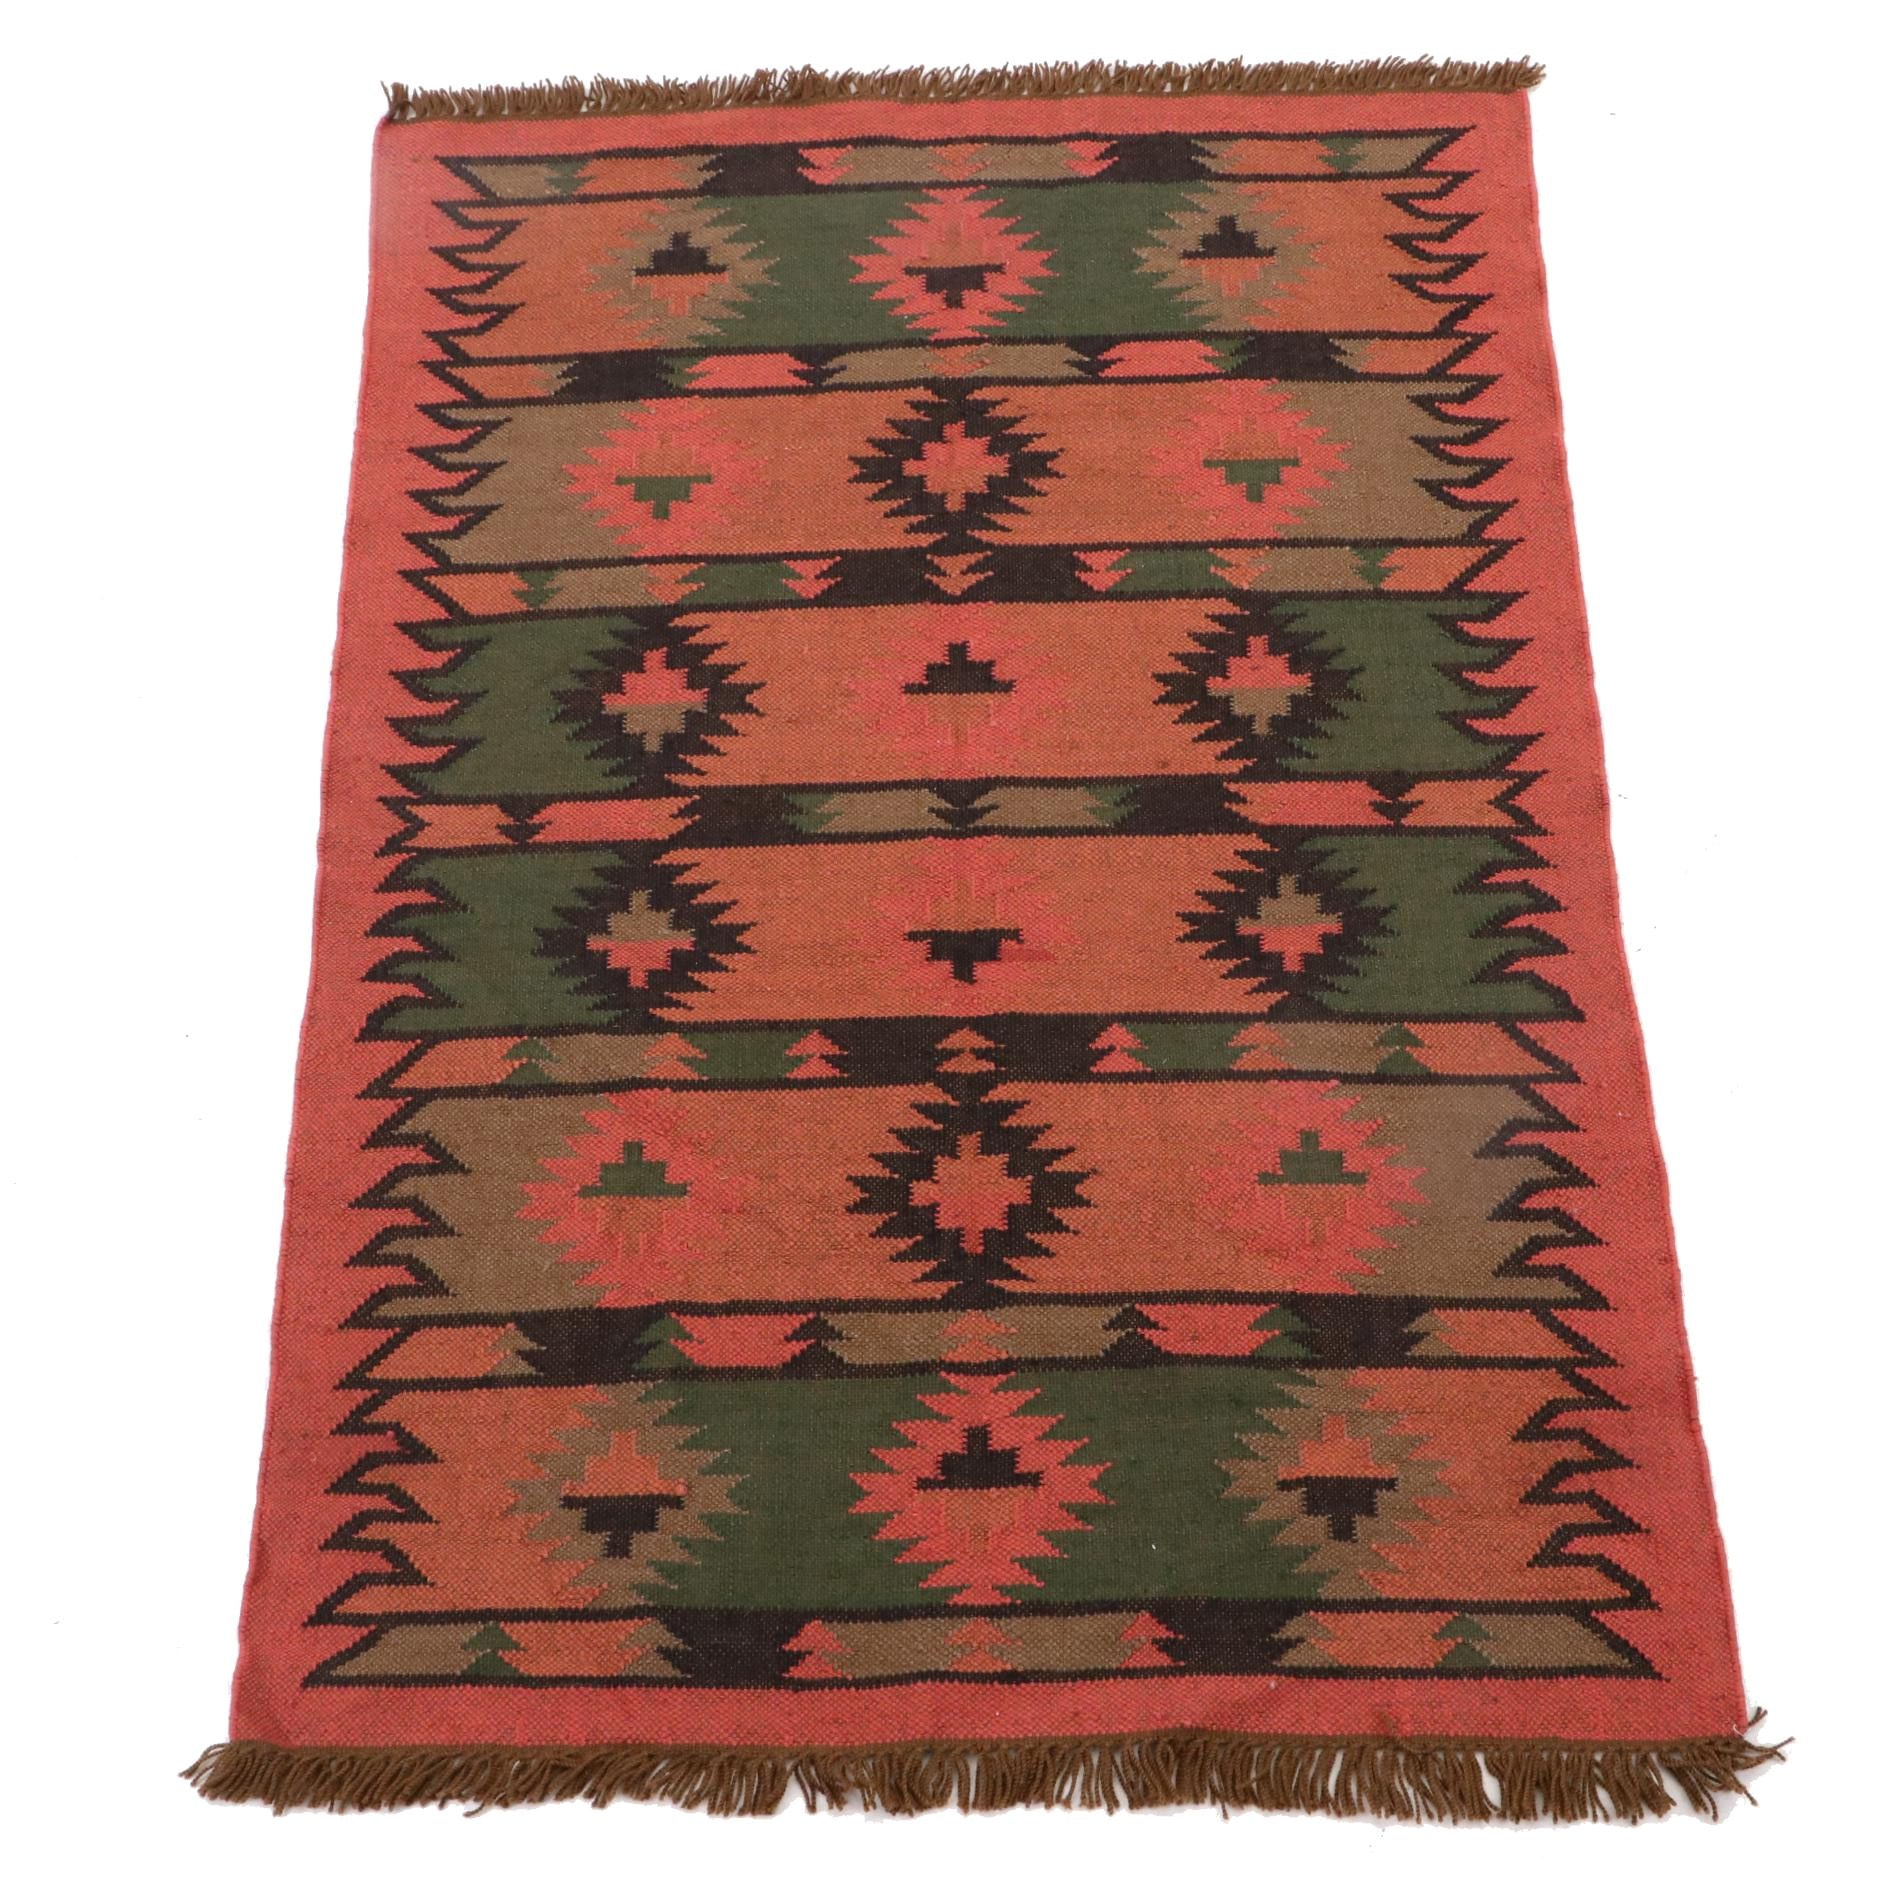 Handwoven Indian Wool Rug